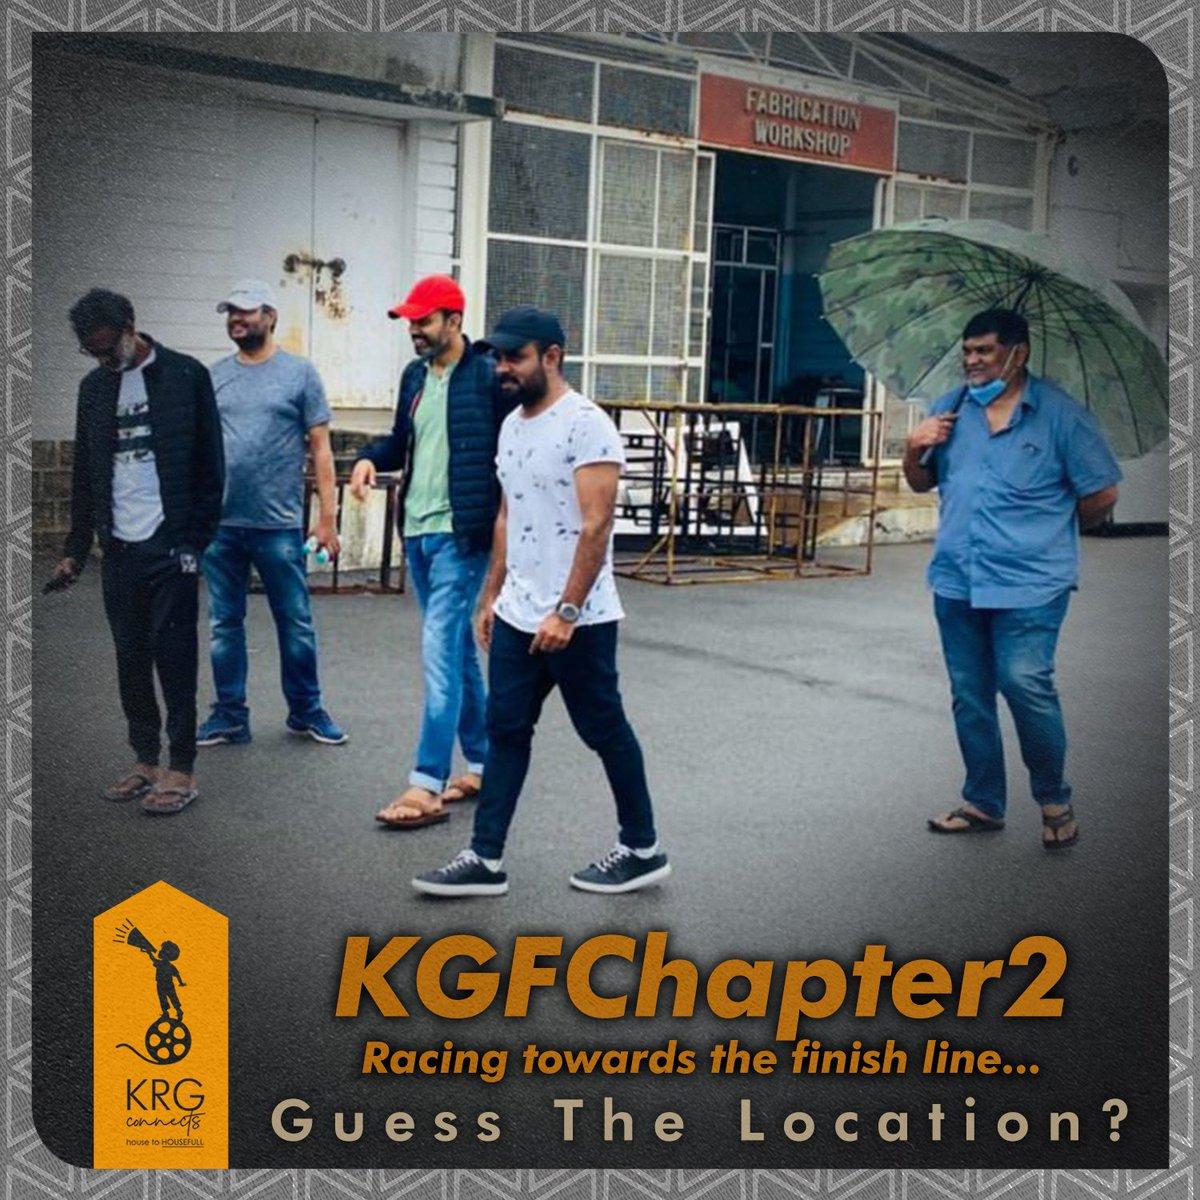 Core team on their fav turf , ready to restart🔥  #KGFCHAPTER2  @prashanth_neel @Karthik1423 @bhuvangowda84 #Shivakumar @hombalefilms https://t.co/5MQwdqWTem